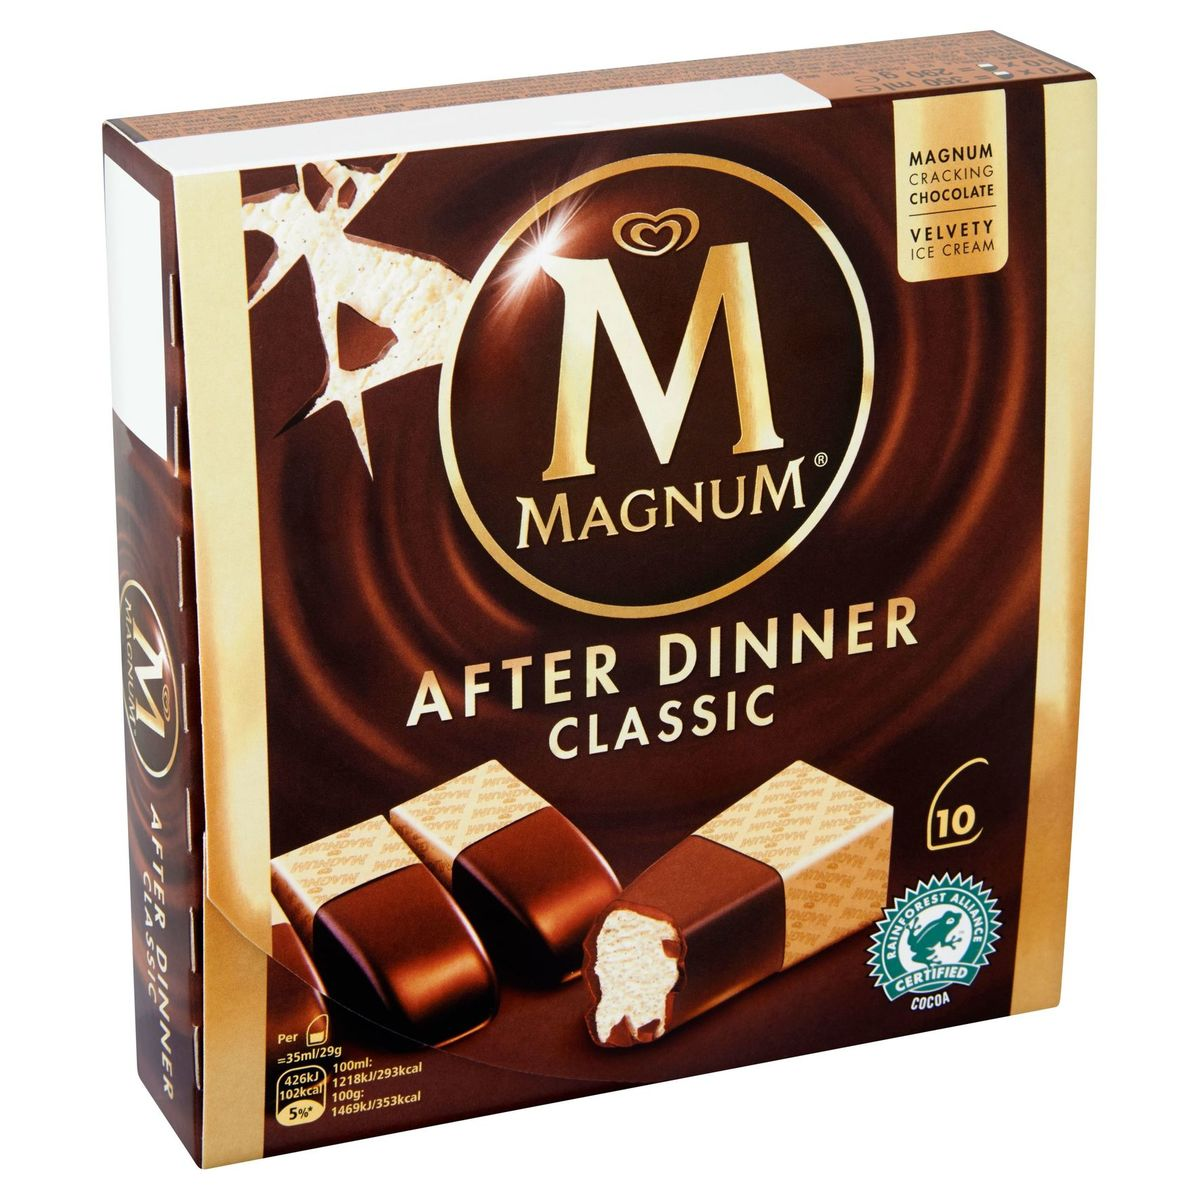 Magnum Ola Ijs After Dinner 10 x 35 ml